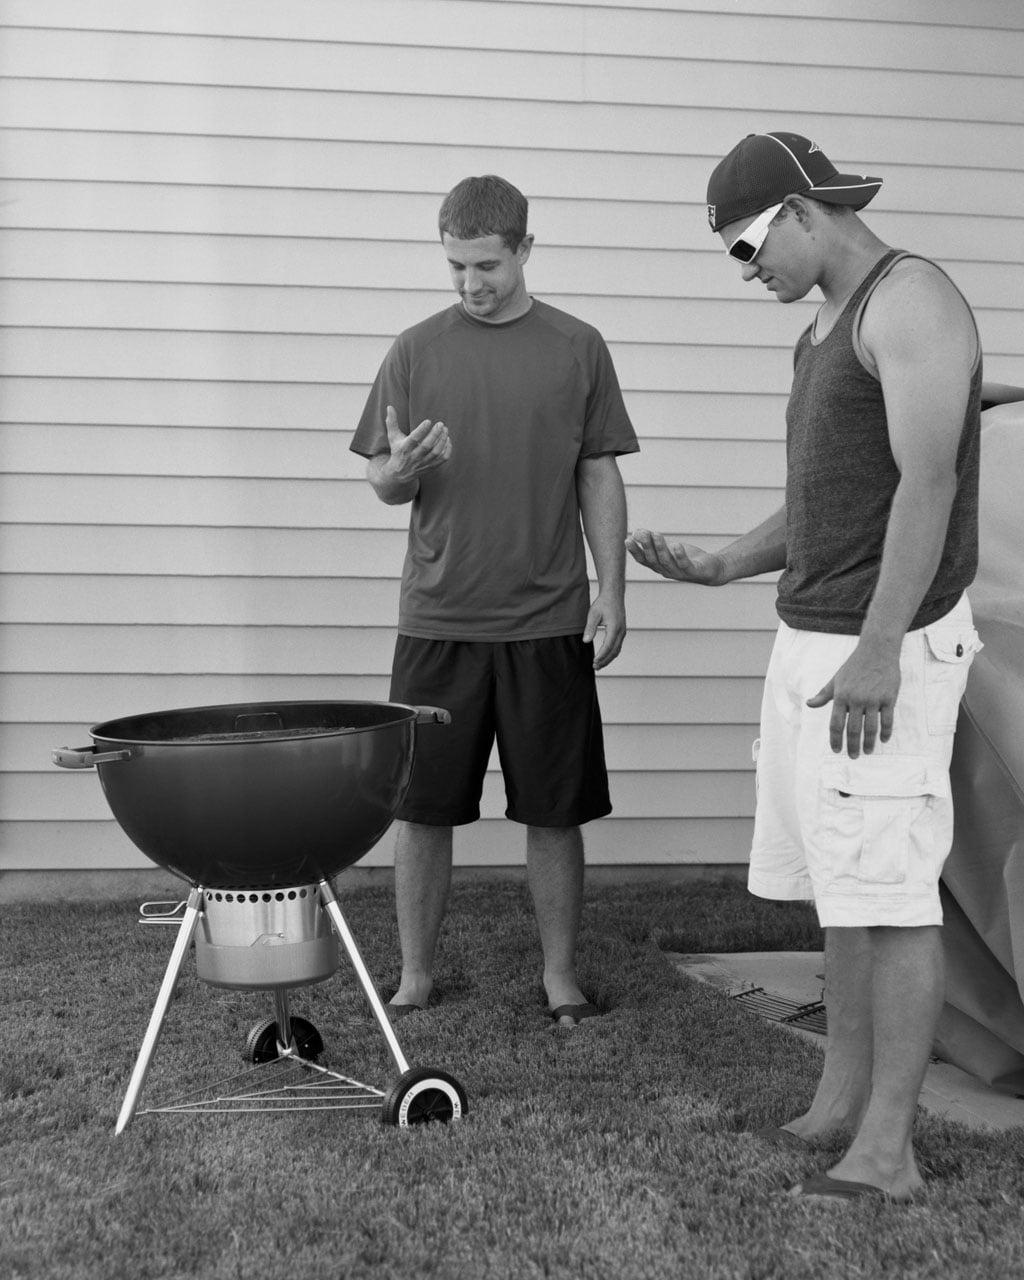 Aaron and Scott - Eric Pickersgill